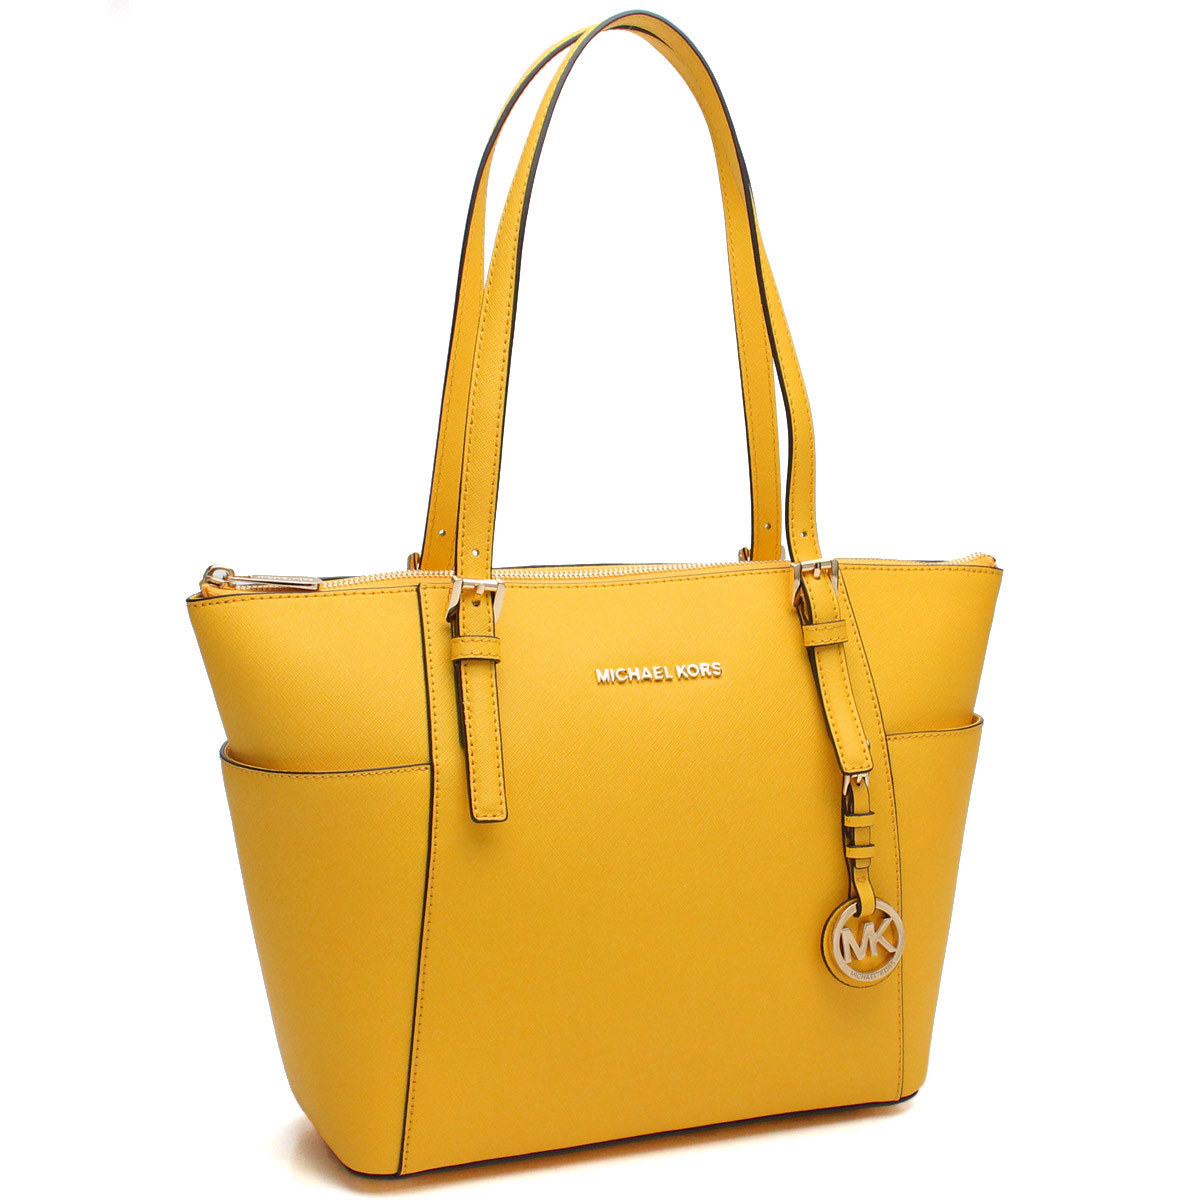 89cc3cfe50c5 Bighit The total brand wholesale: Michael Kors (MICHAEL KORS) JET SET ITEM  jet set item tote bag 30F2GTTT8L SUNFLOWER yellow | Rakuten Global Market